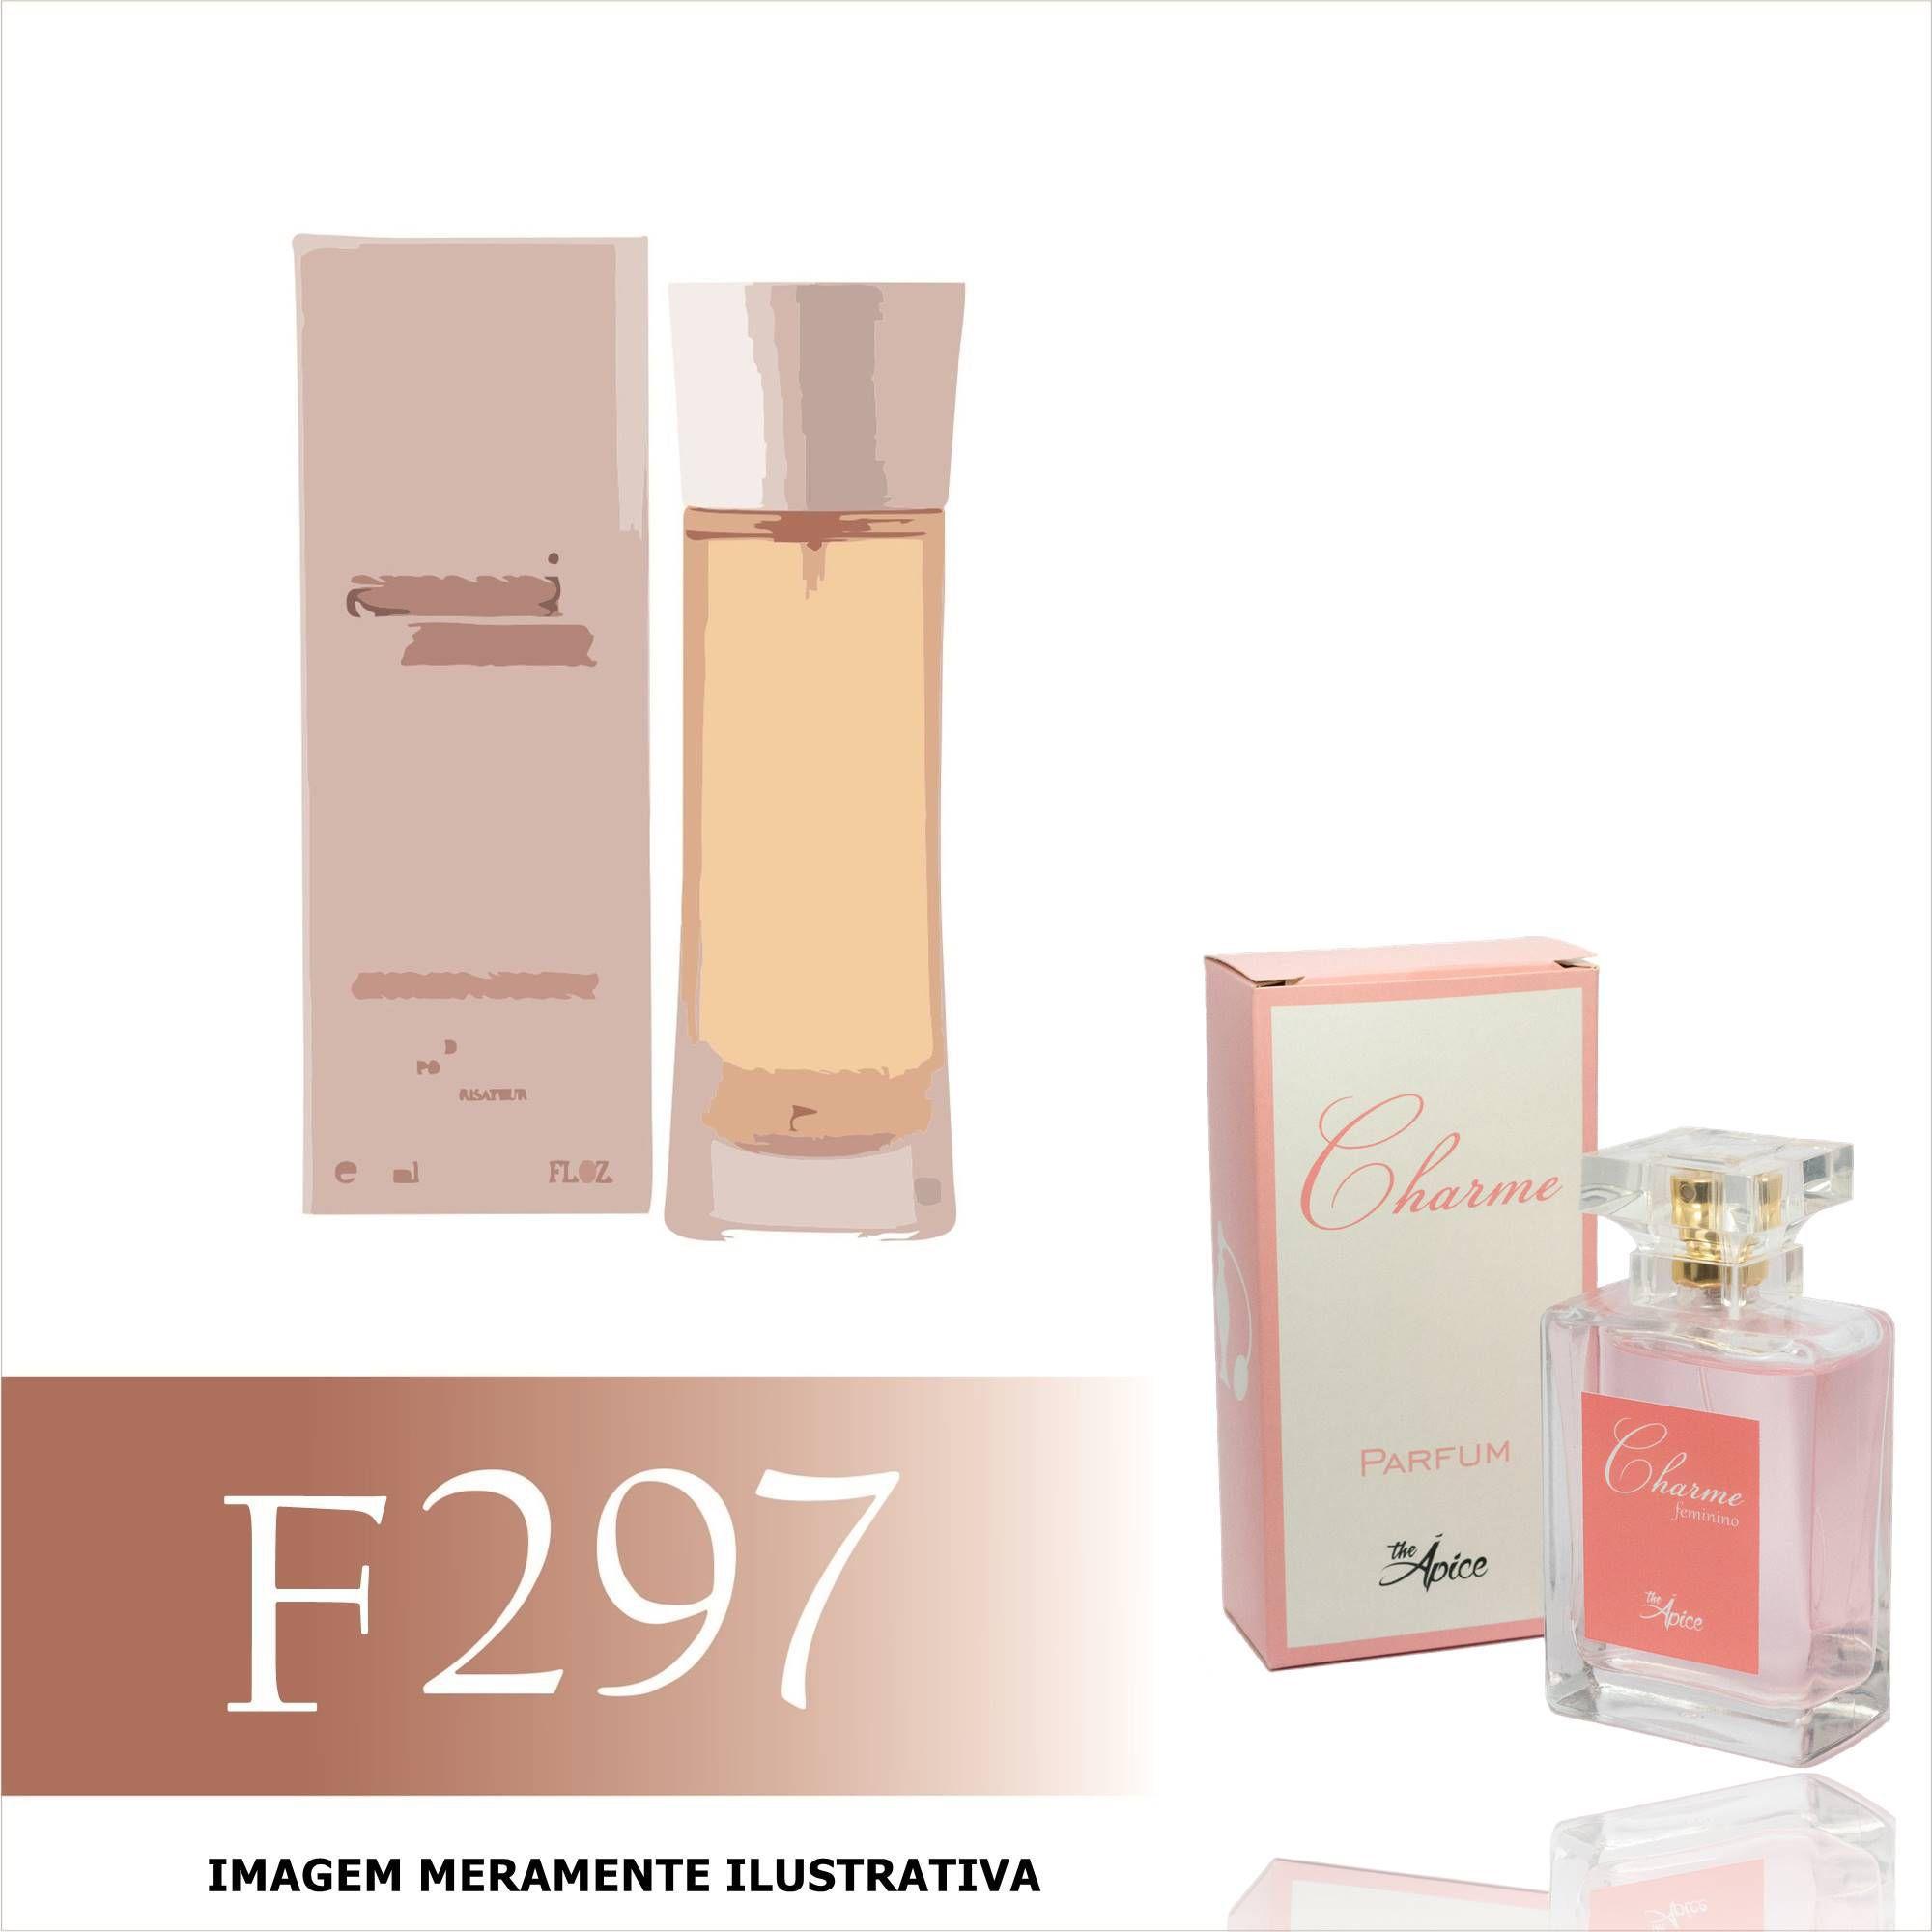 3074b7227 Perfume F297 Inspirado no Armani Mania da Giorgio Armani Feminino